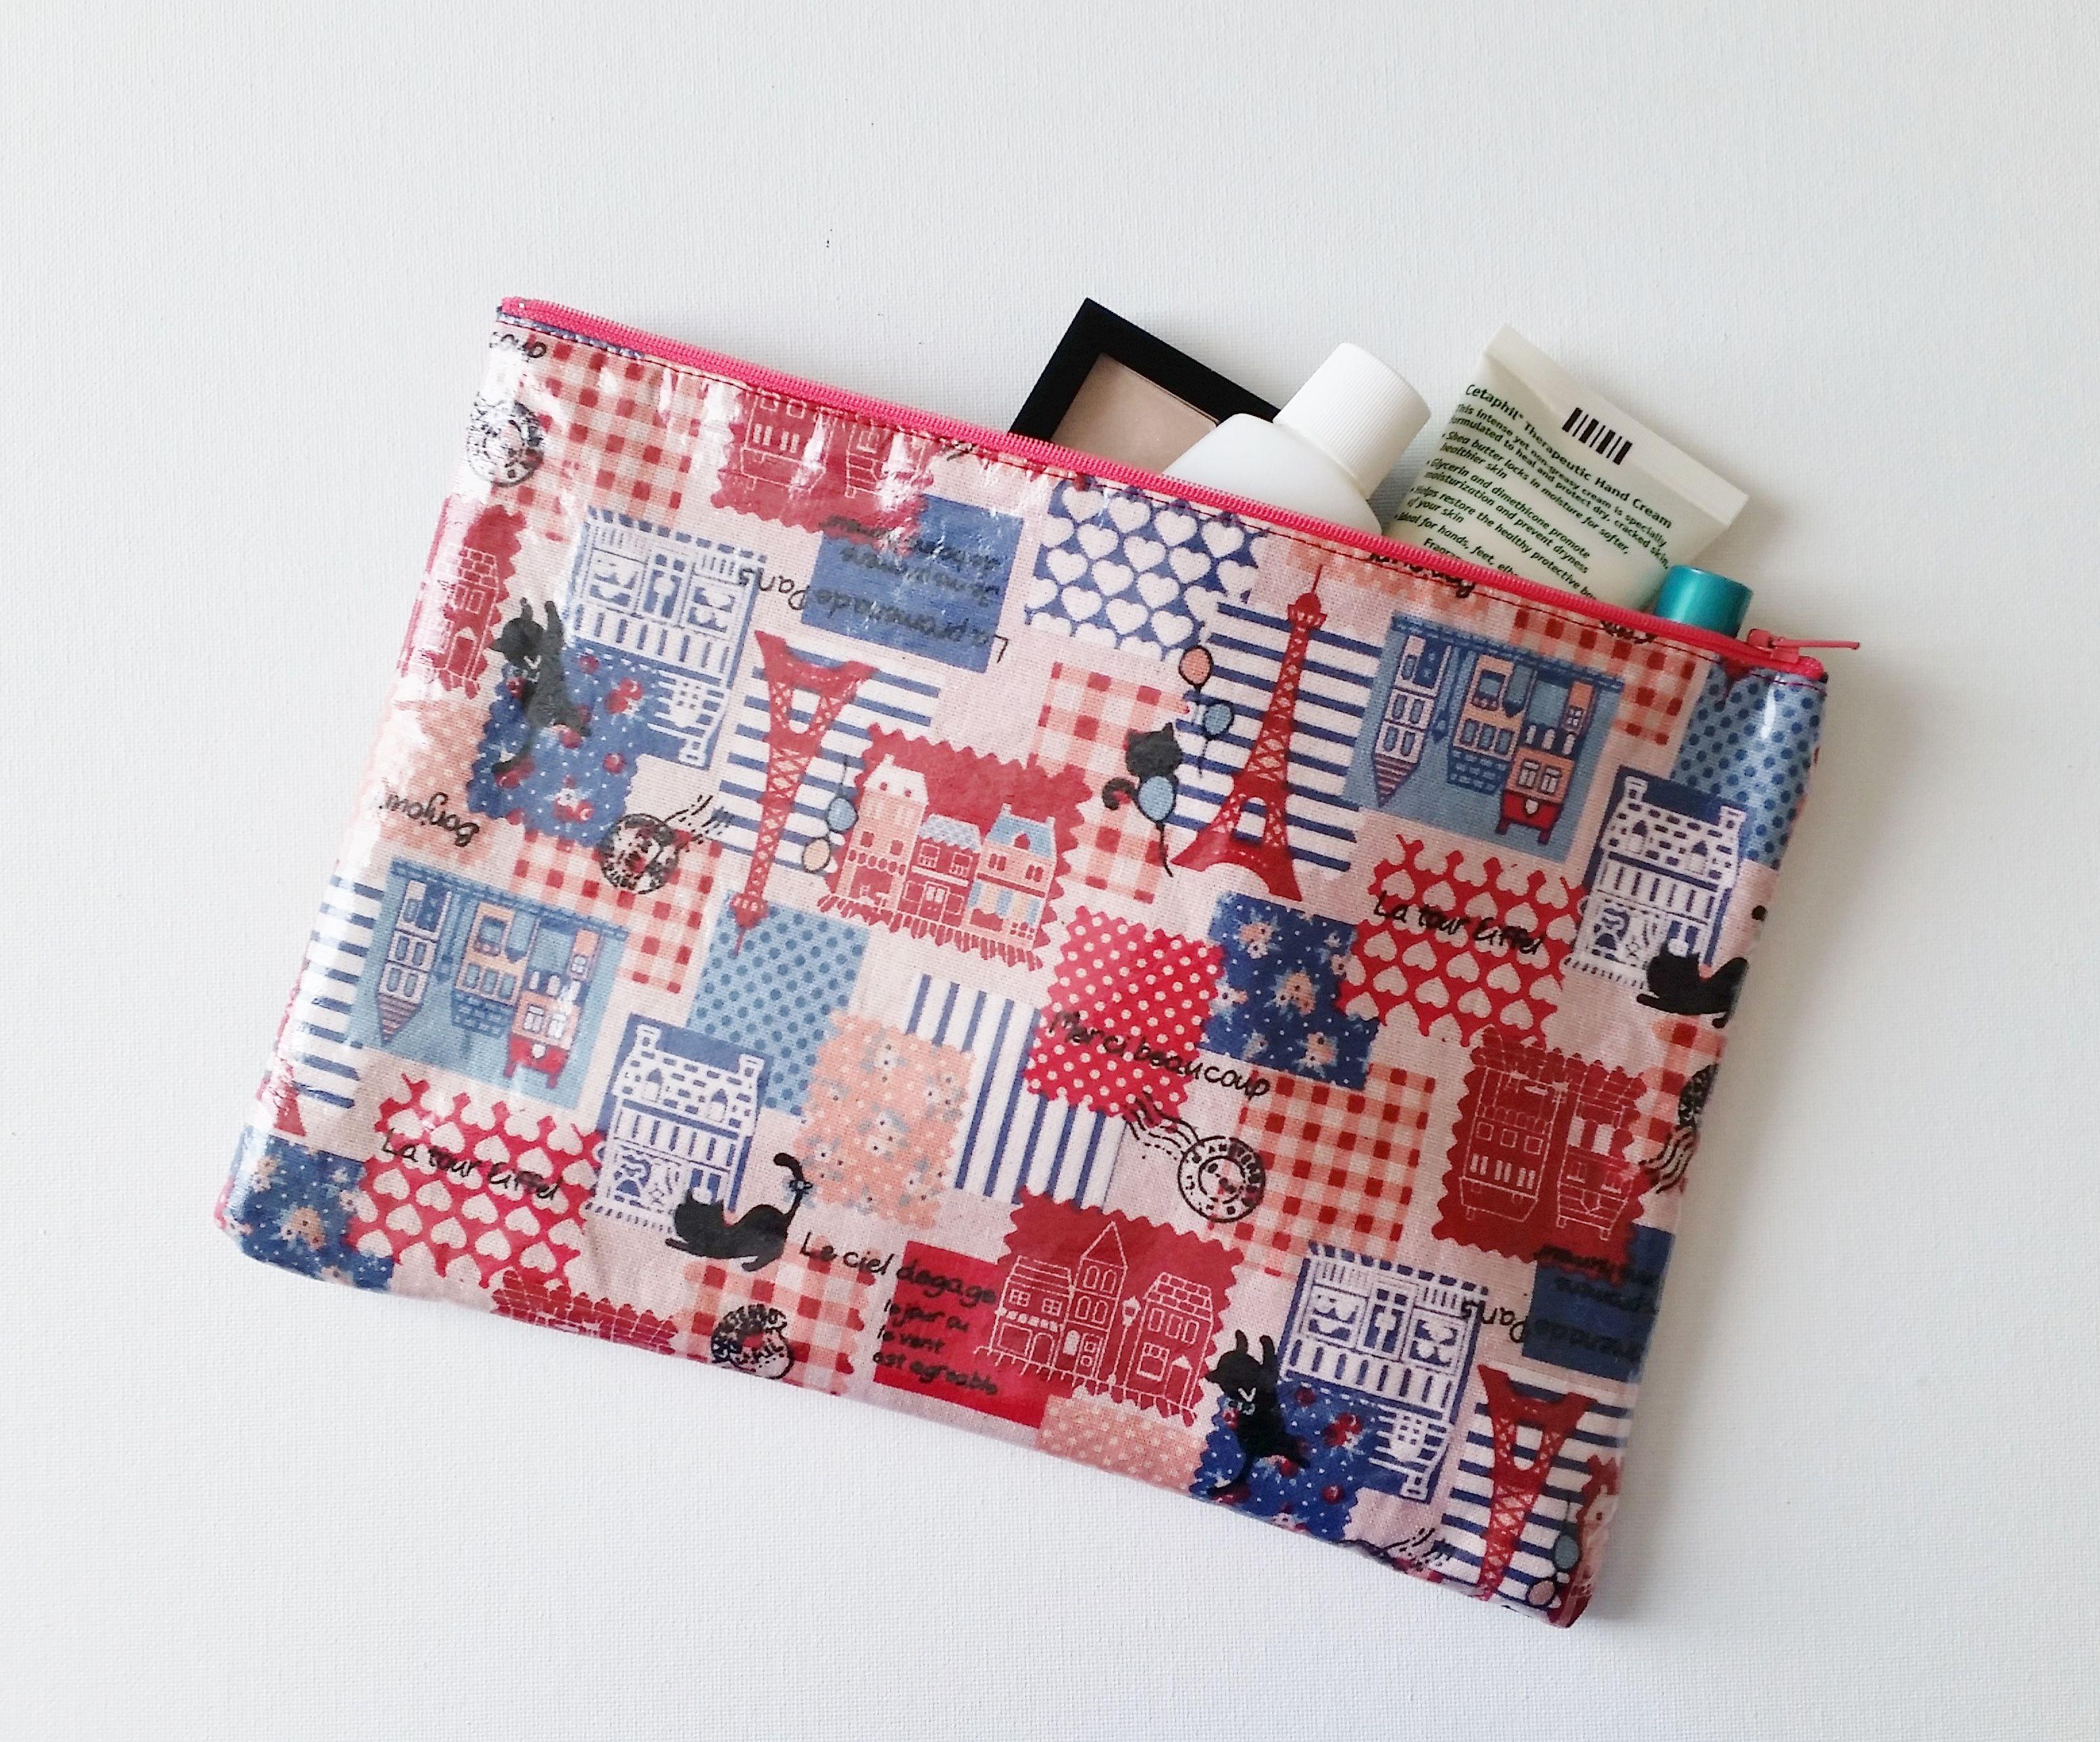 DIY Laminate Fabric Pouch Tutorial - | Laminated fabric ...